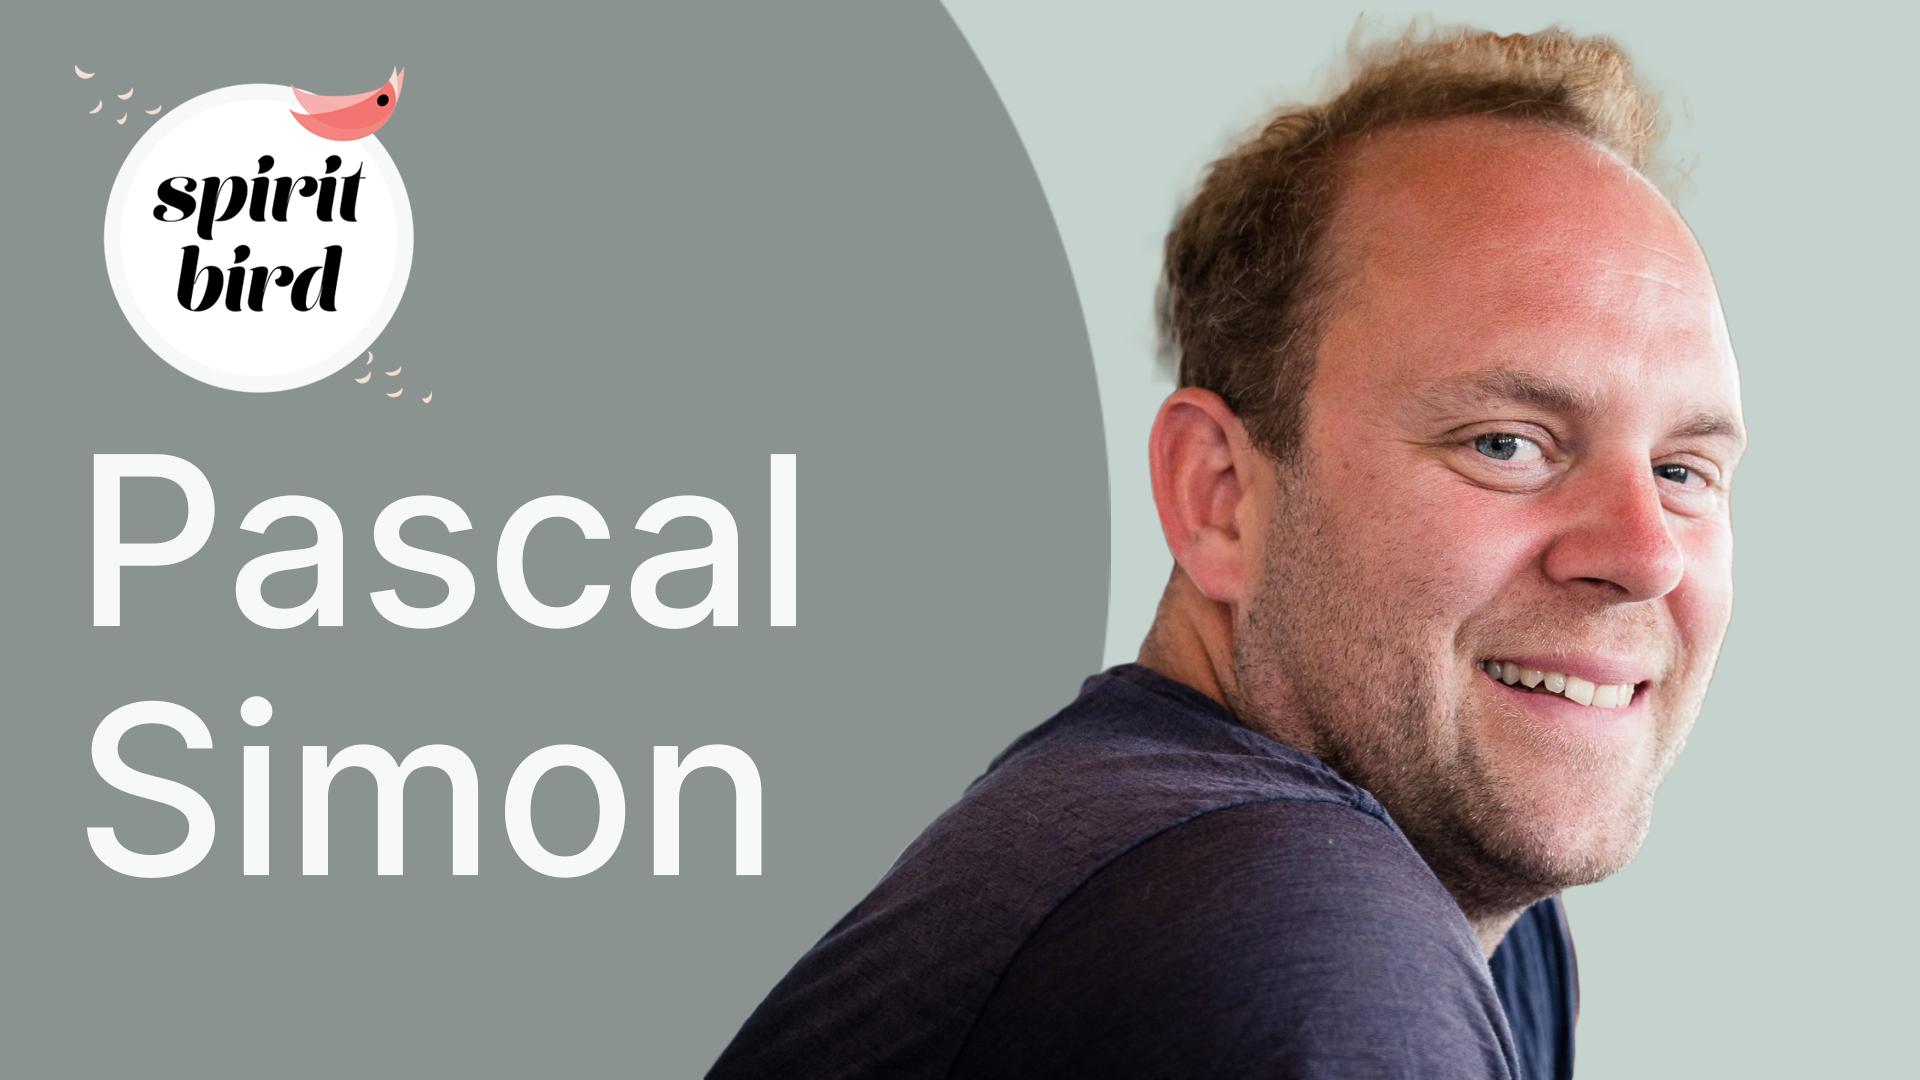 pascal simon speaker session on youtube